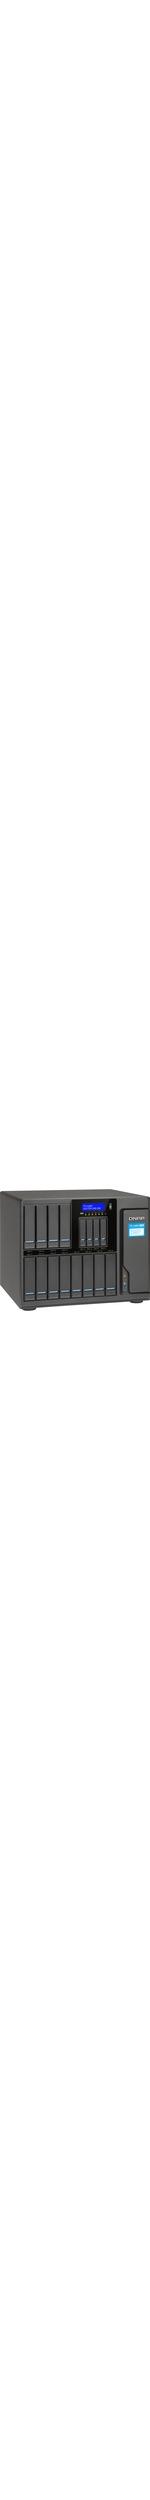 QNAP Turbo NAS TS-1685 16 x Total Bays SAN/NAS Storage System - Desktop - Intel Xeon D-1521 Quad-core